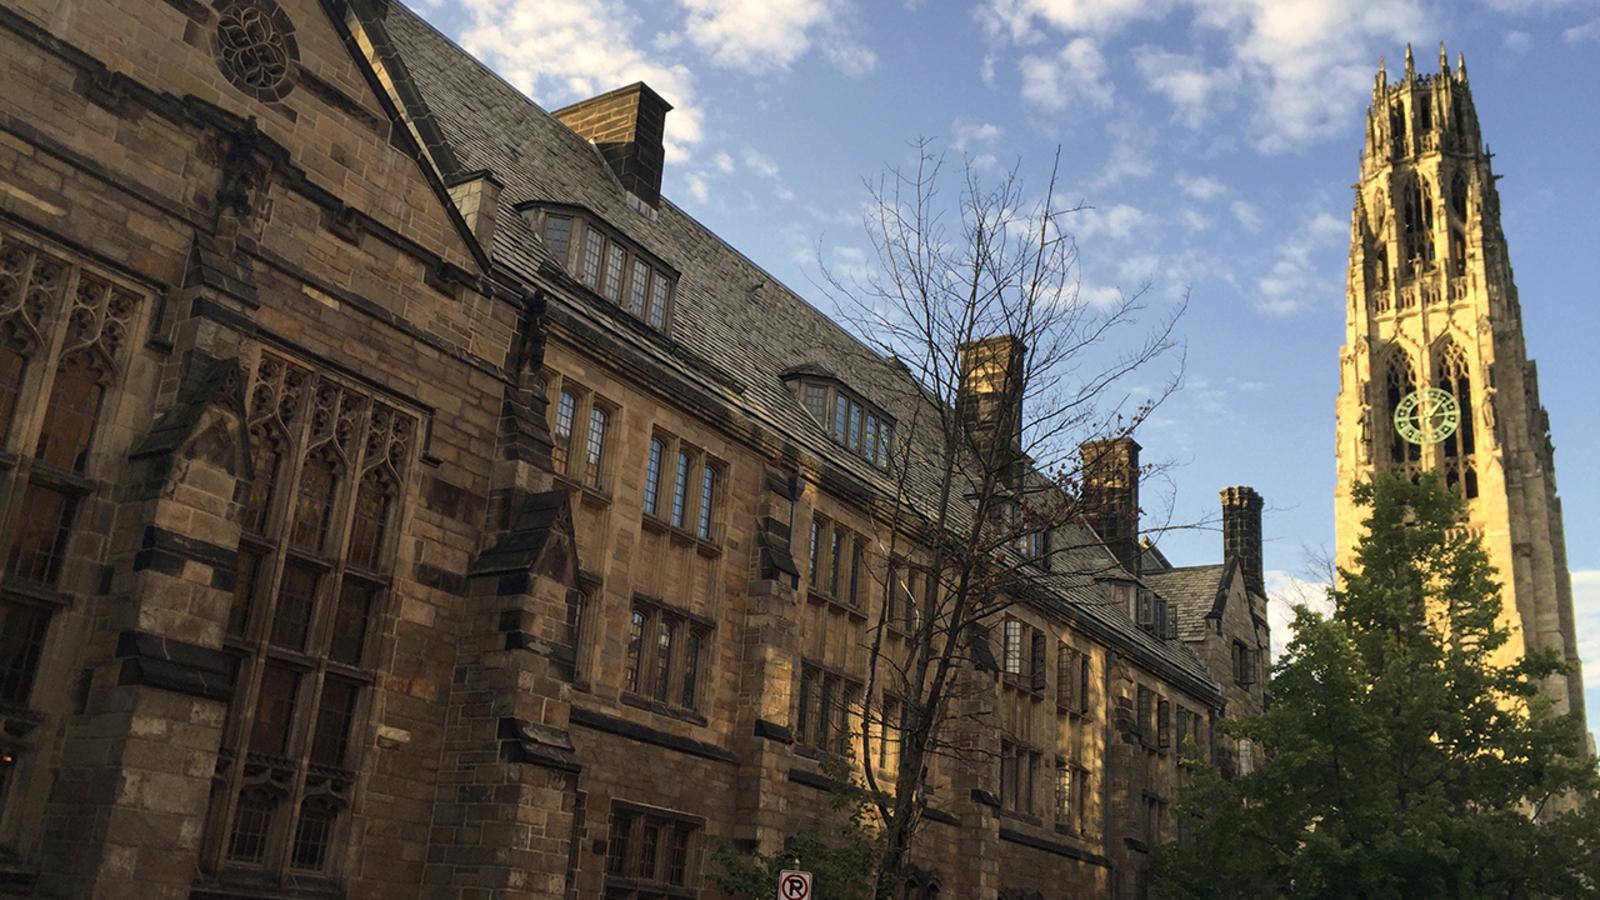 abc7chicago.com: DOJ accuses Yale University of discriminating against Asian, white applicants